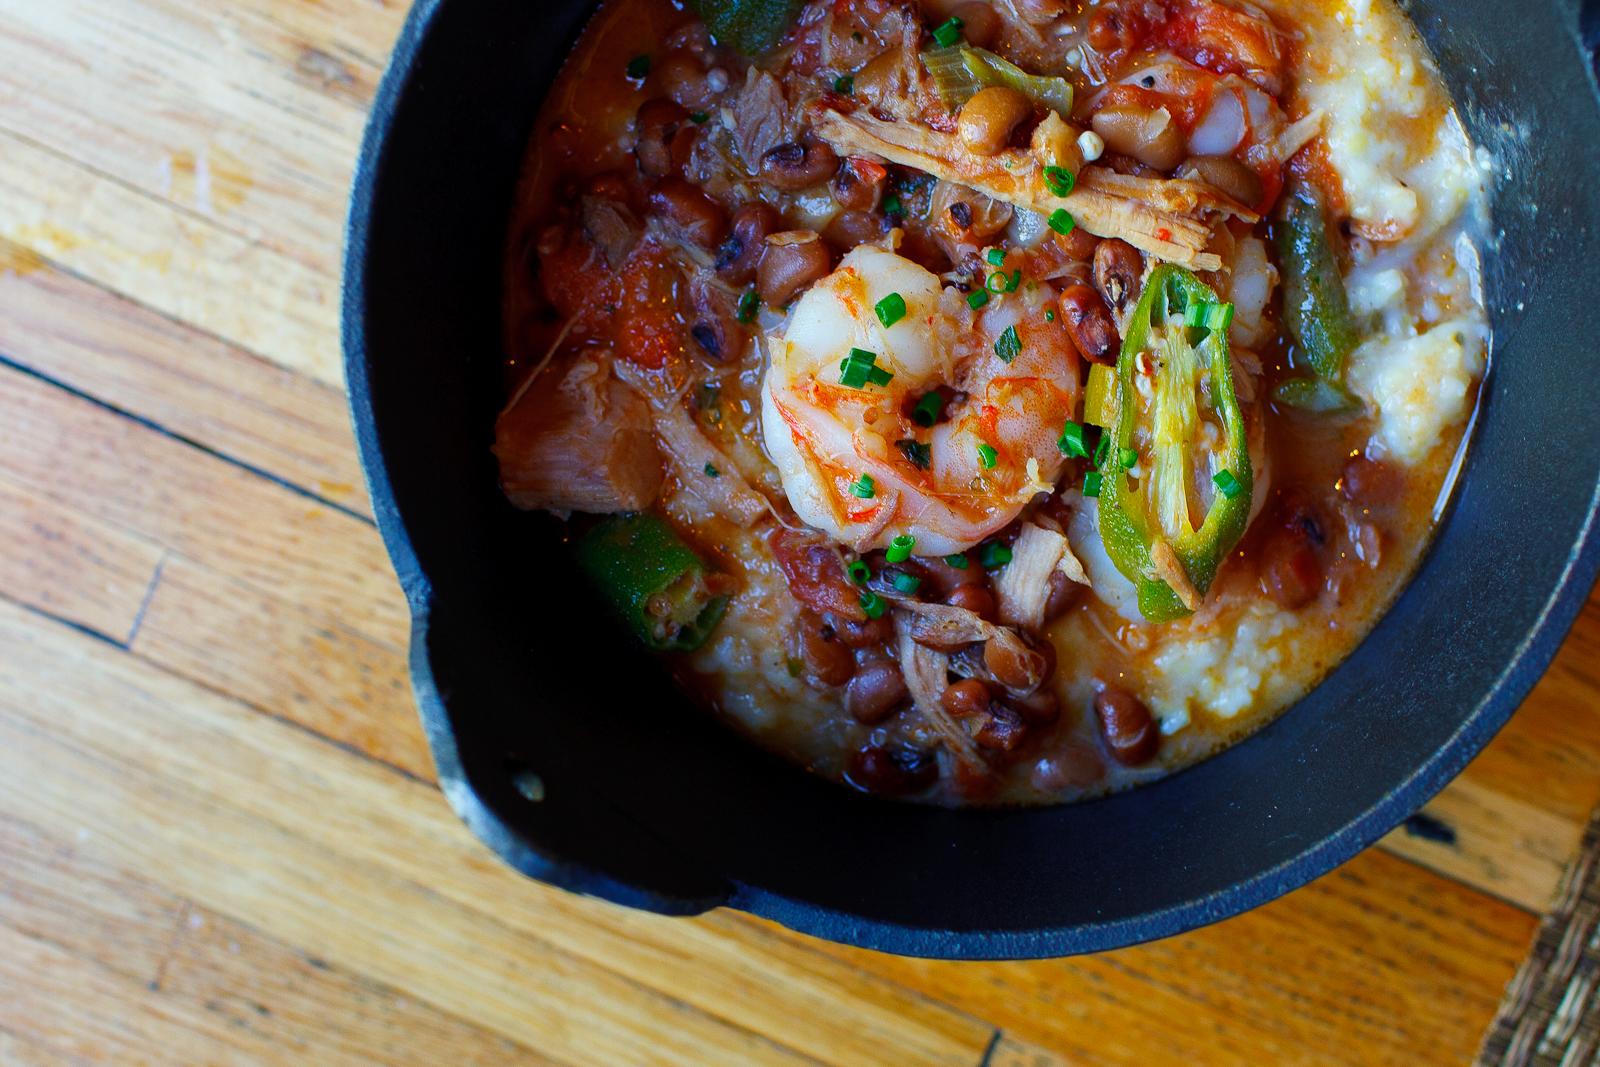 South Carolina shrimp grits with okra, tomatoes, sea island red peas and Virginia pulled pork ($14)